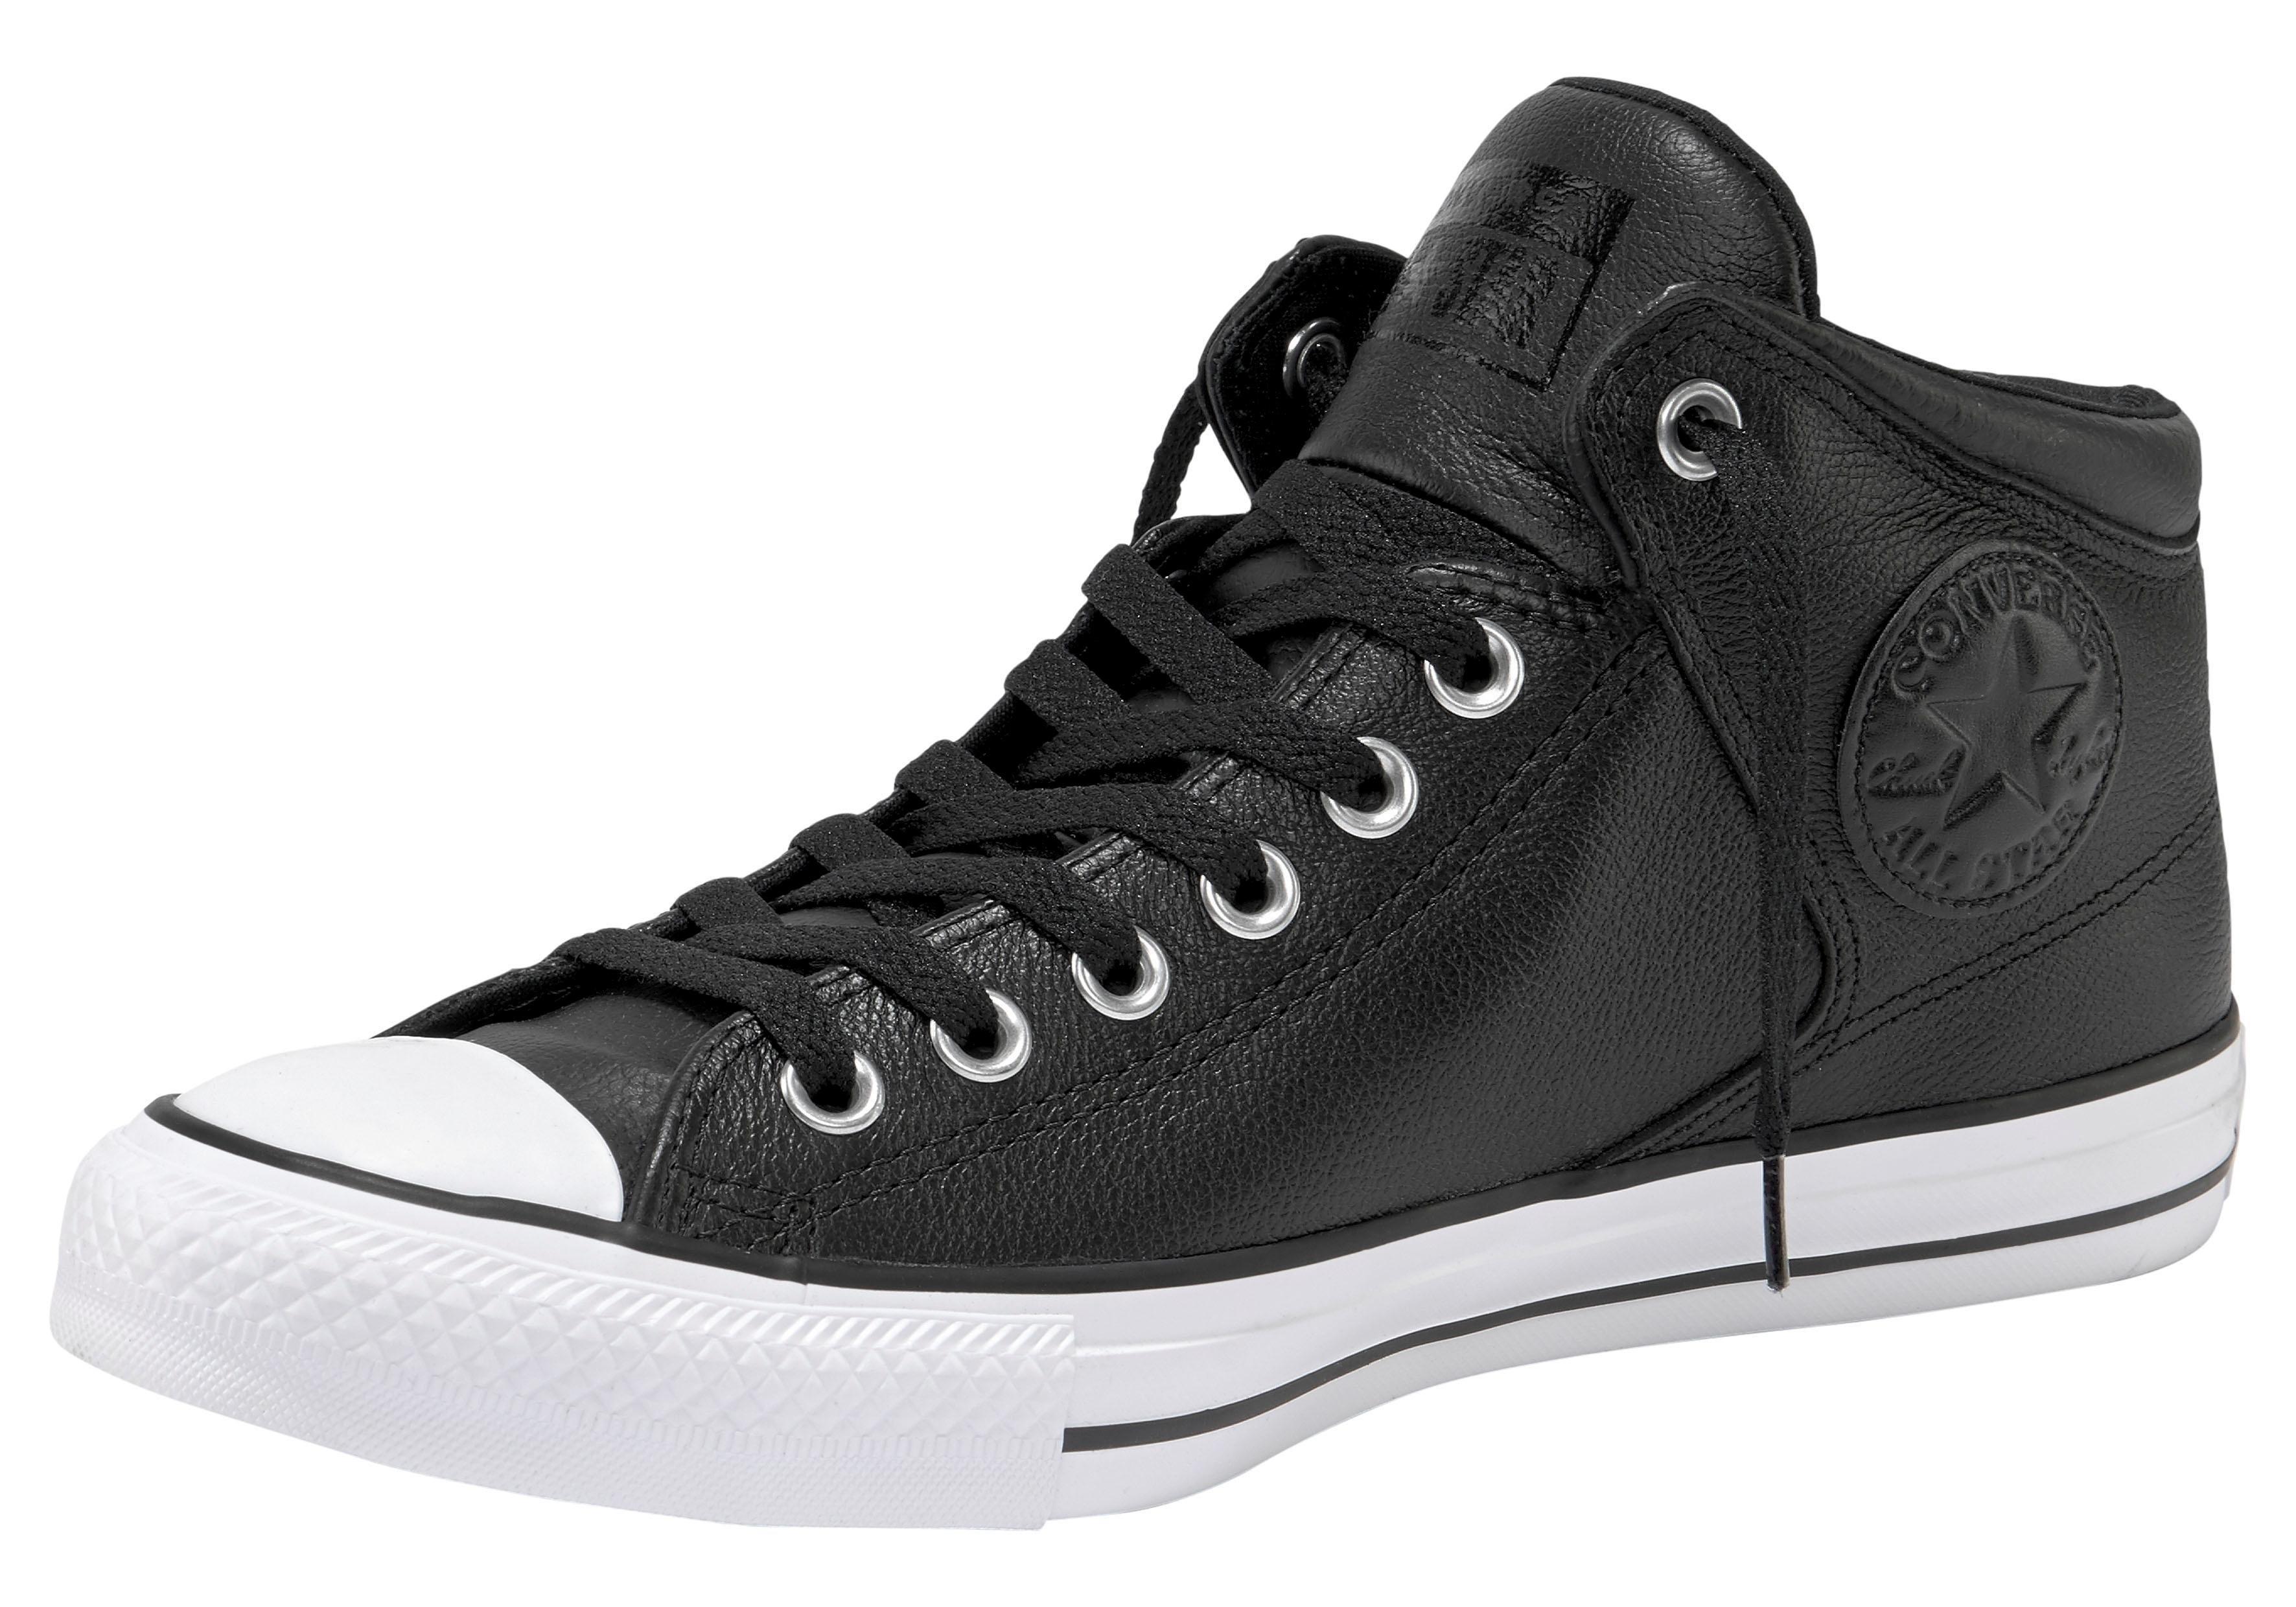 908f9e44dbd Afbeeldingsbron: Converse sneakers »Chuck Taylor All Star High Street Hi«